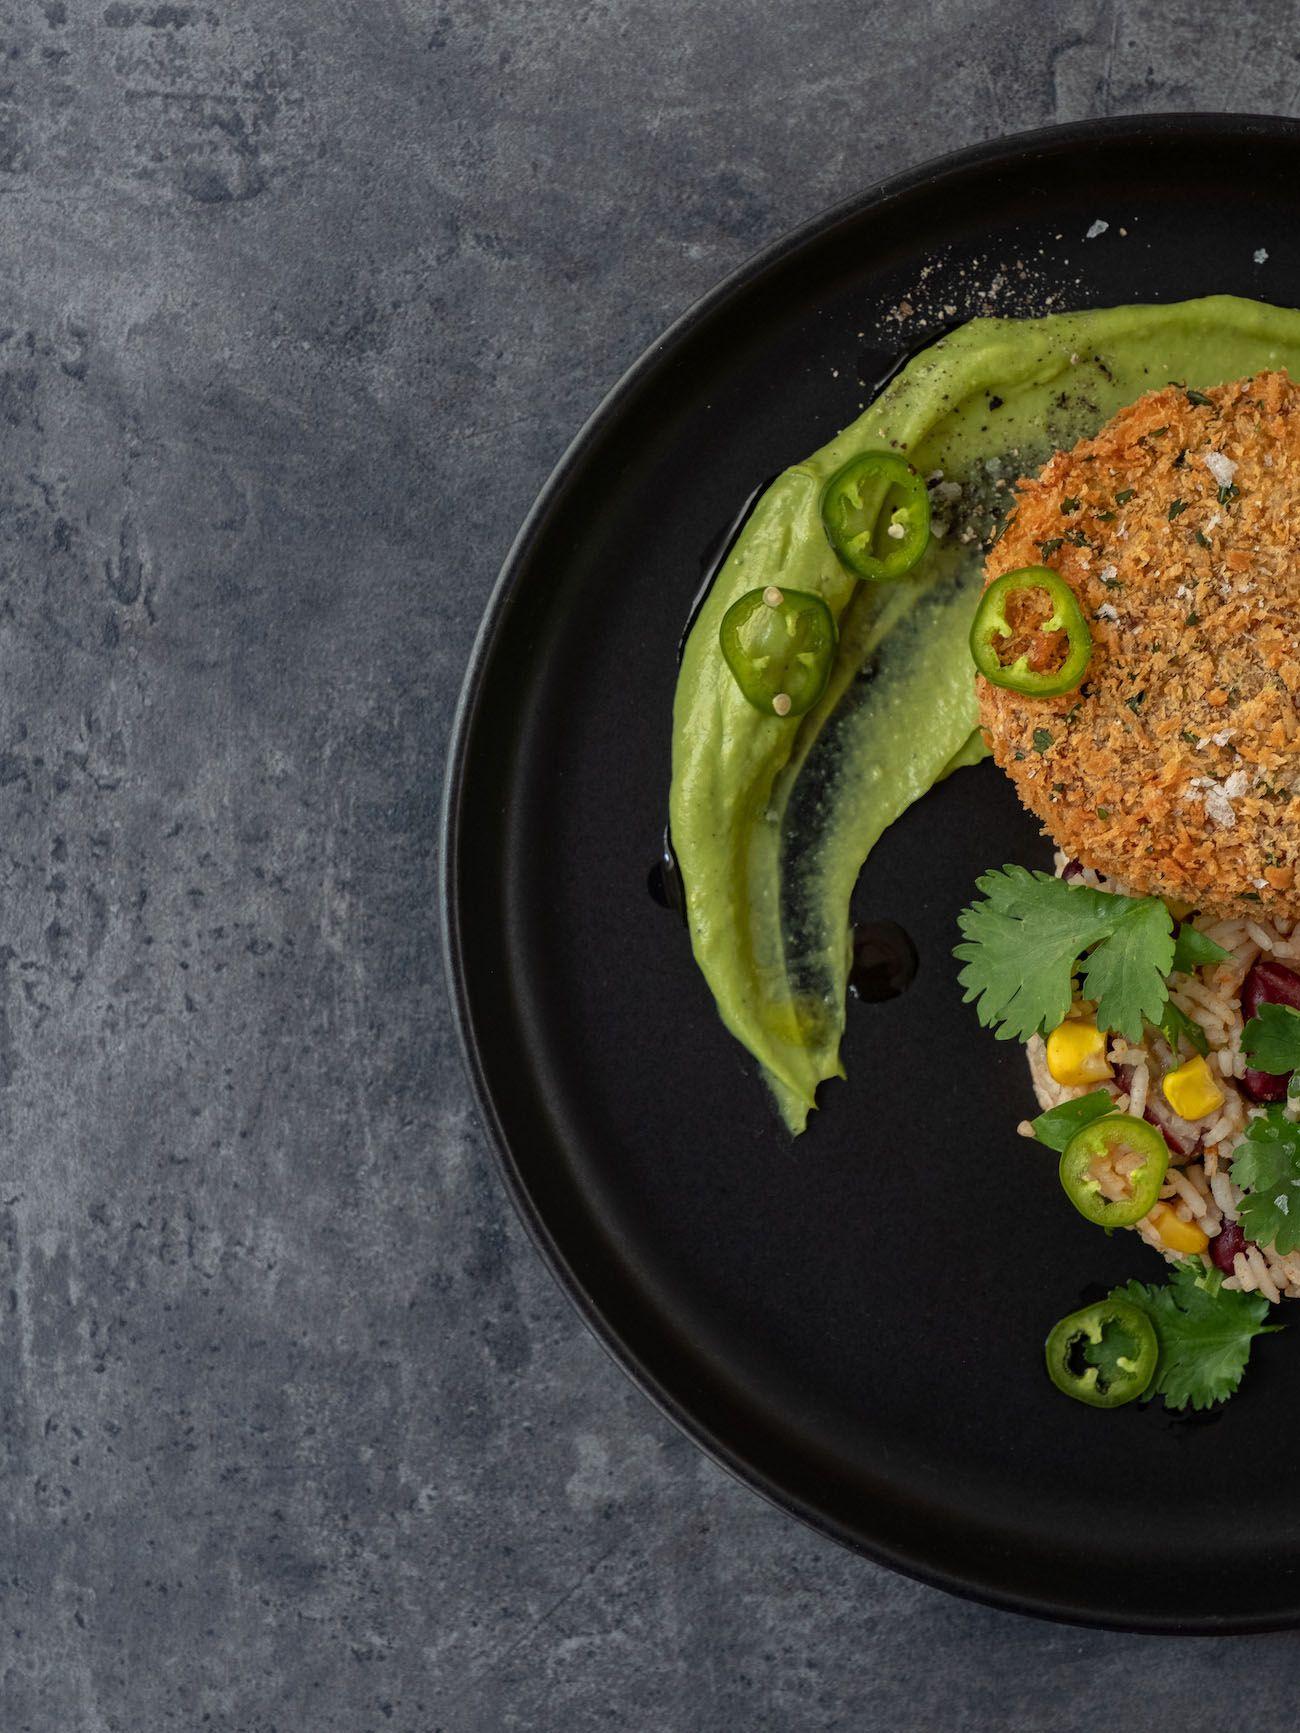 About Fuel, Foodblog, Bold Foods, Rezept, The Big T Schnitzel mit Reis und Avocadocreme, Mais, Jalapeño, Bohnen